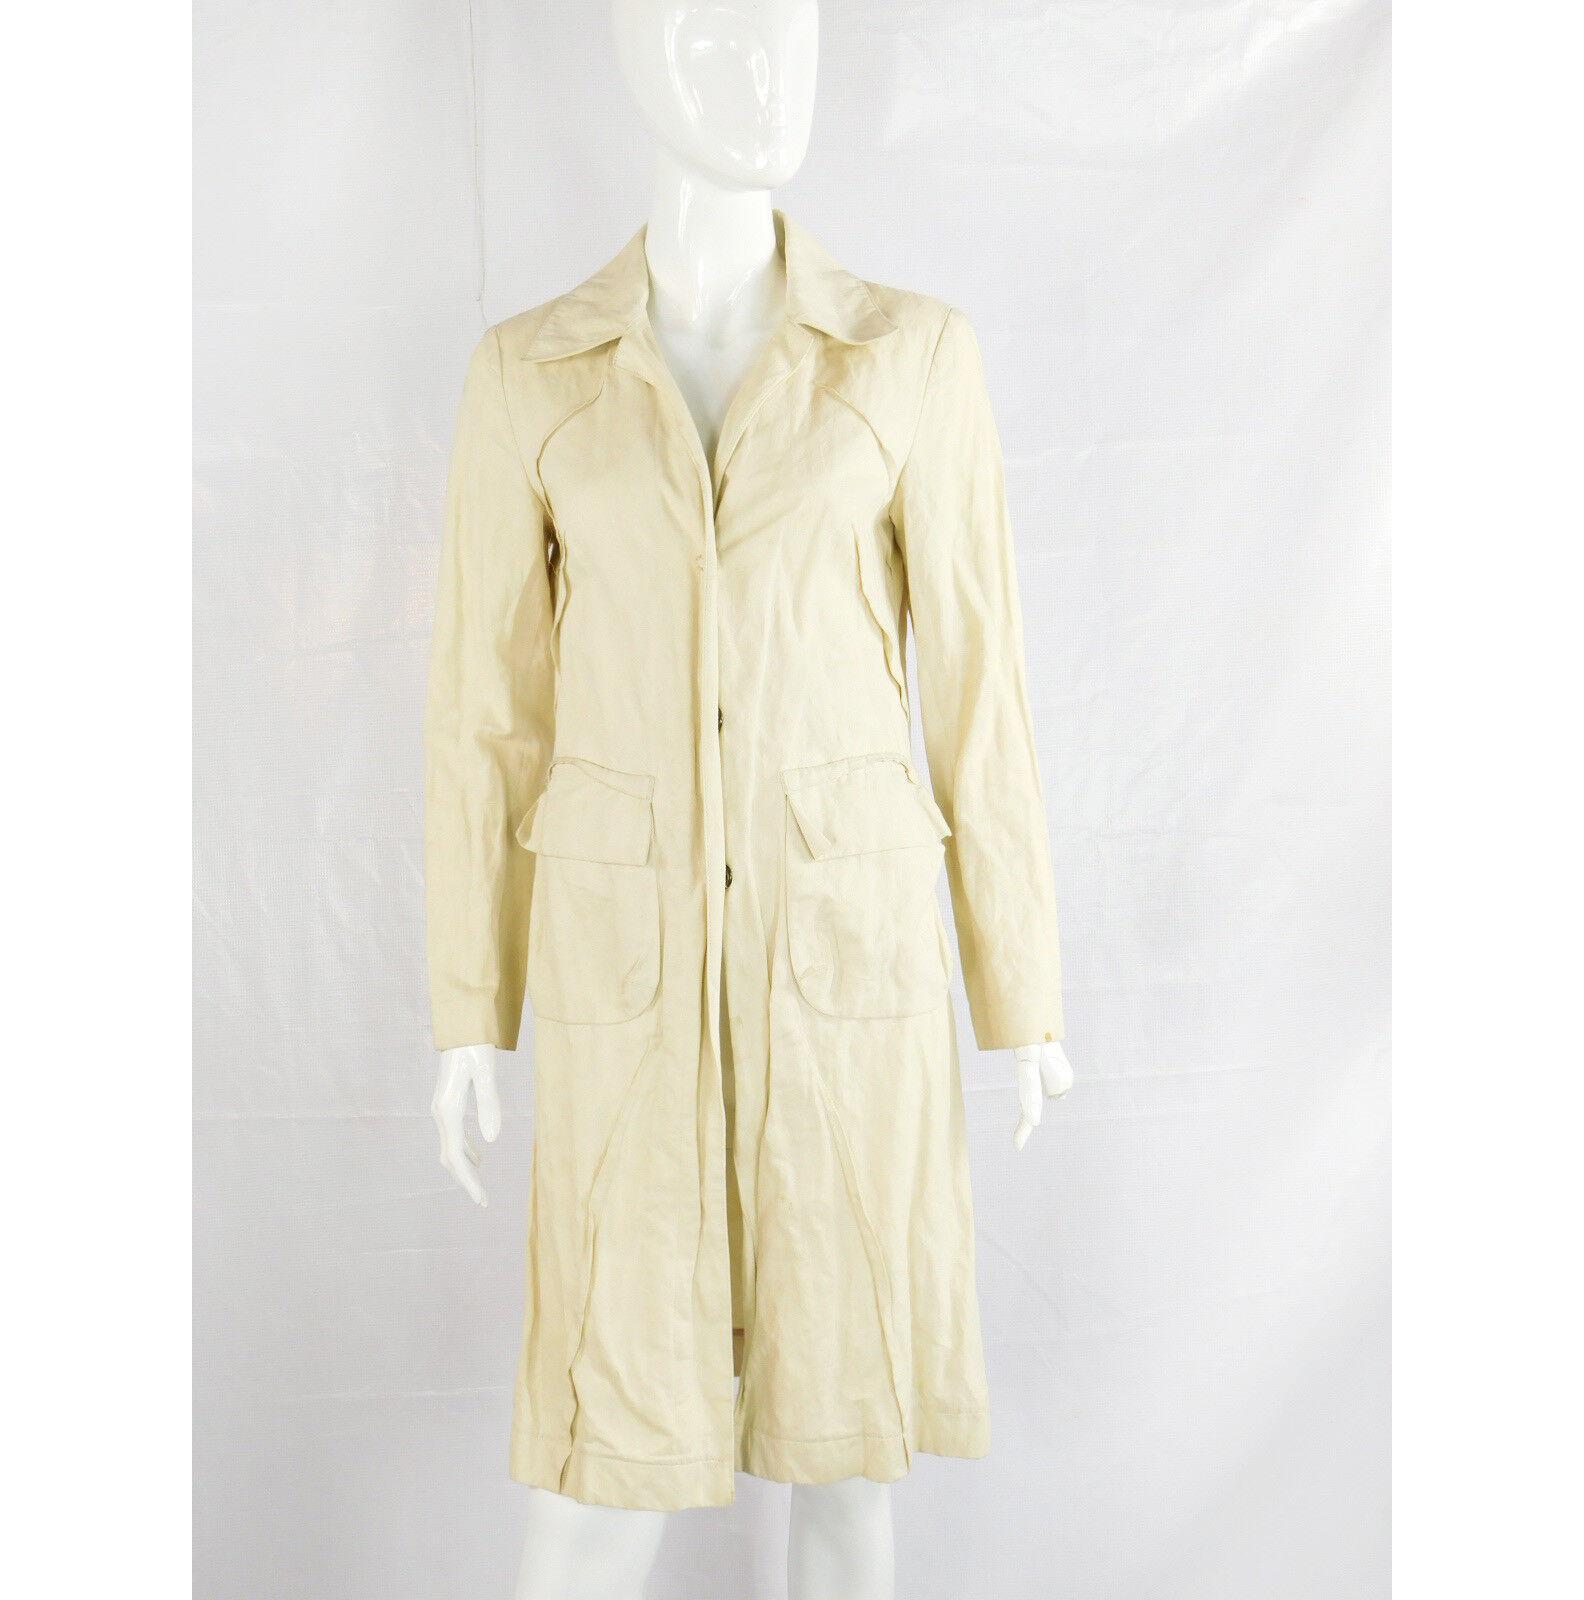 Pinko Light Tan Cotton    Trench Coat - Size 4 159462